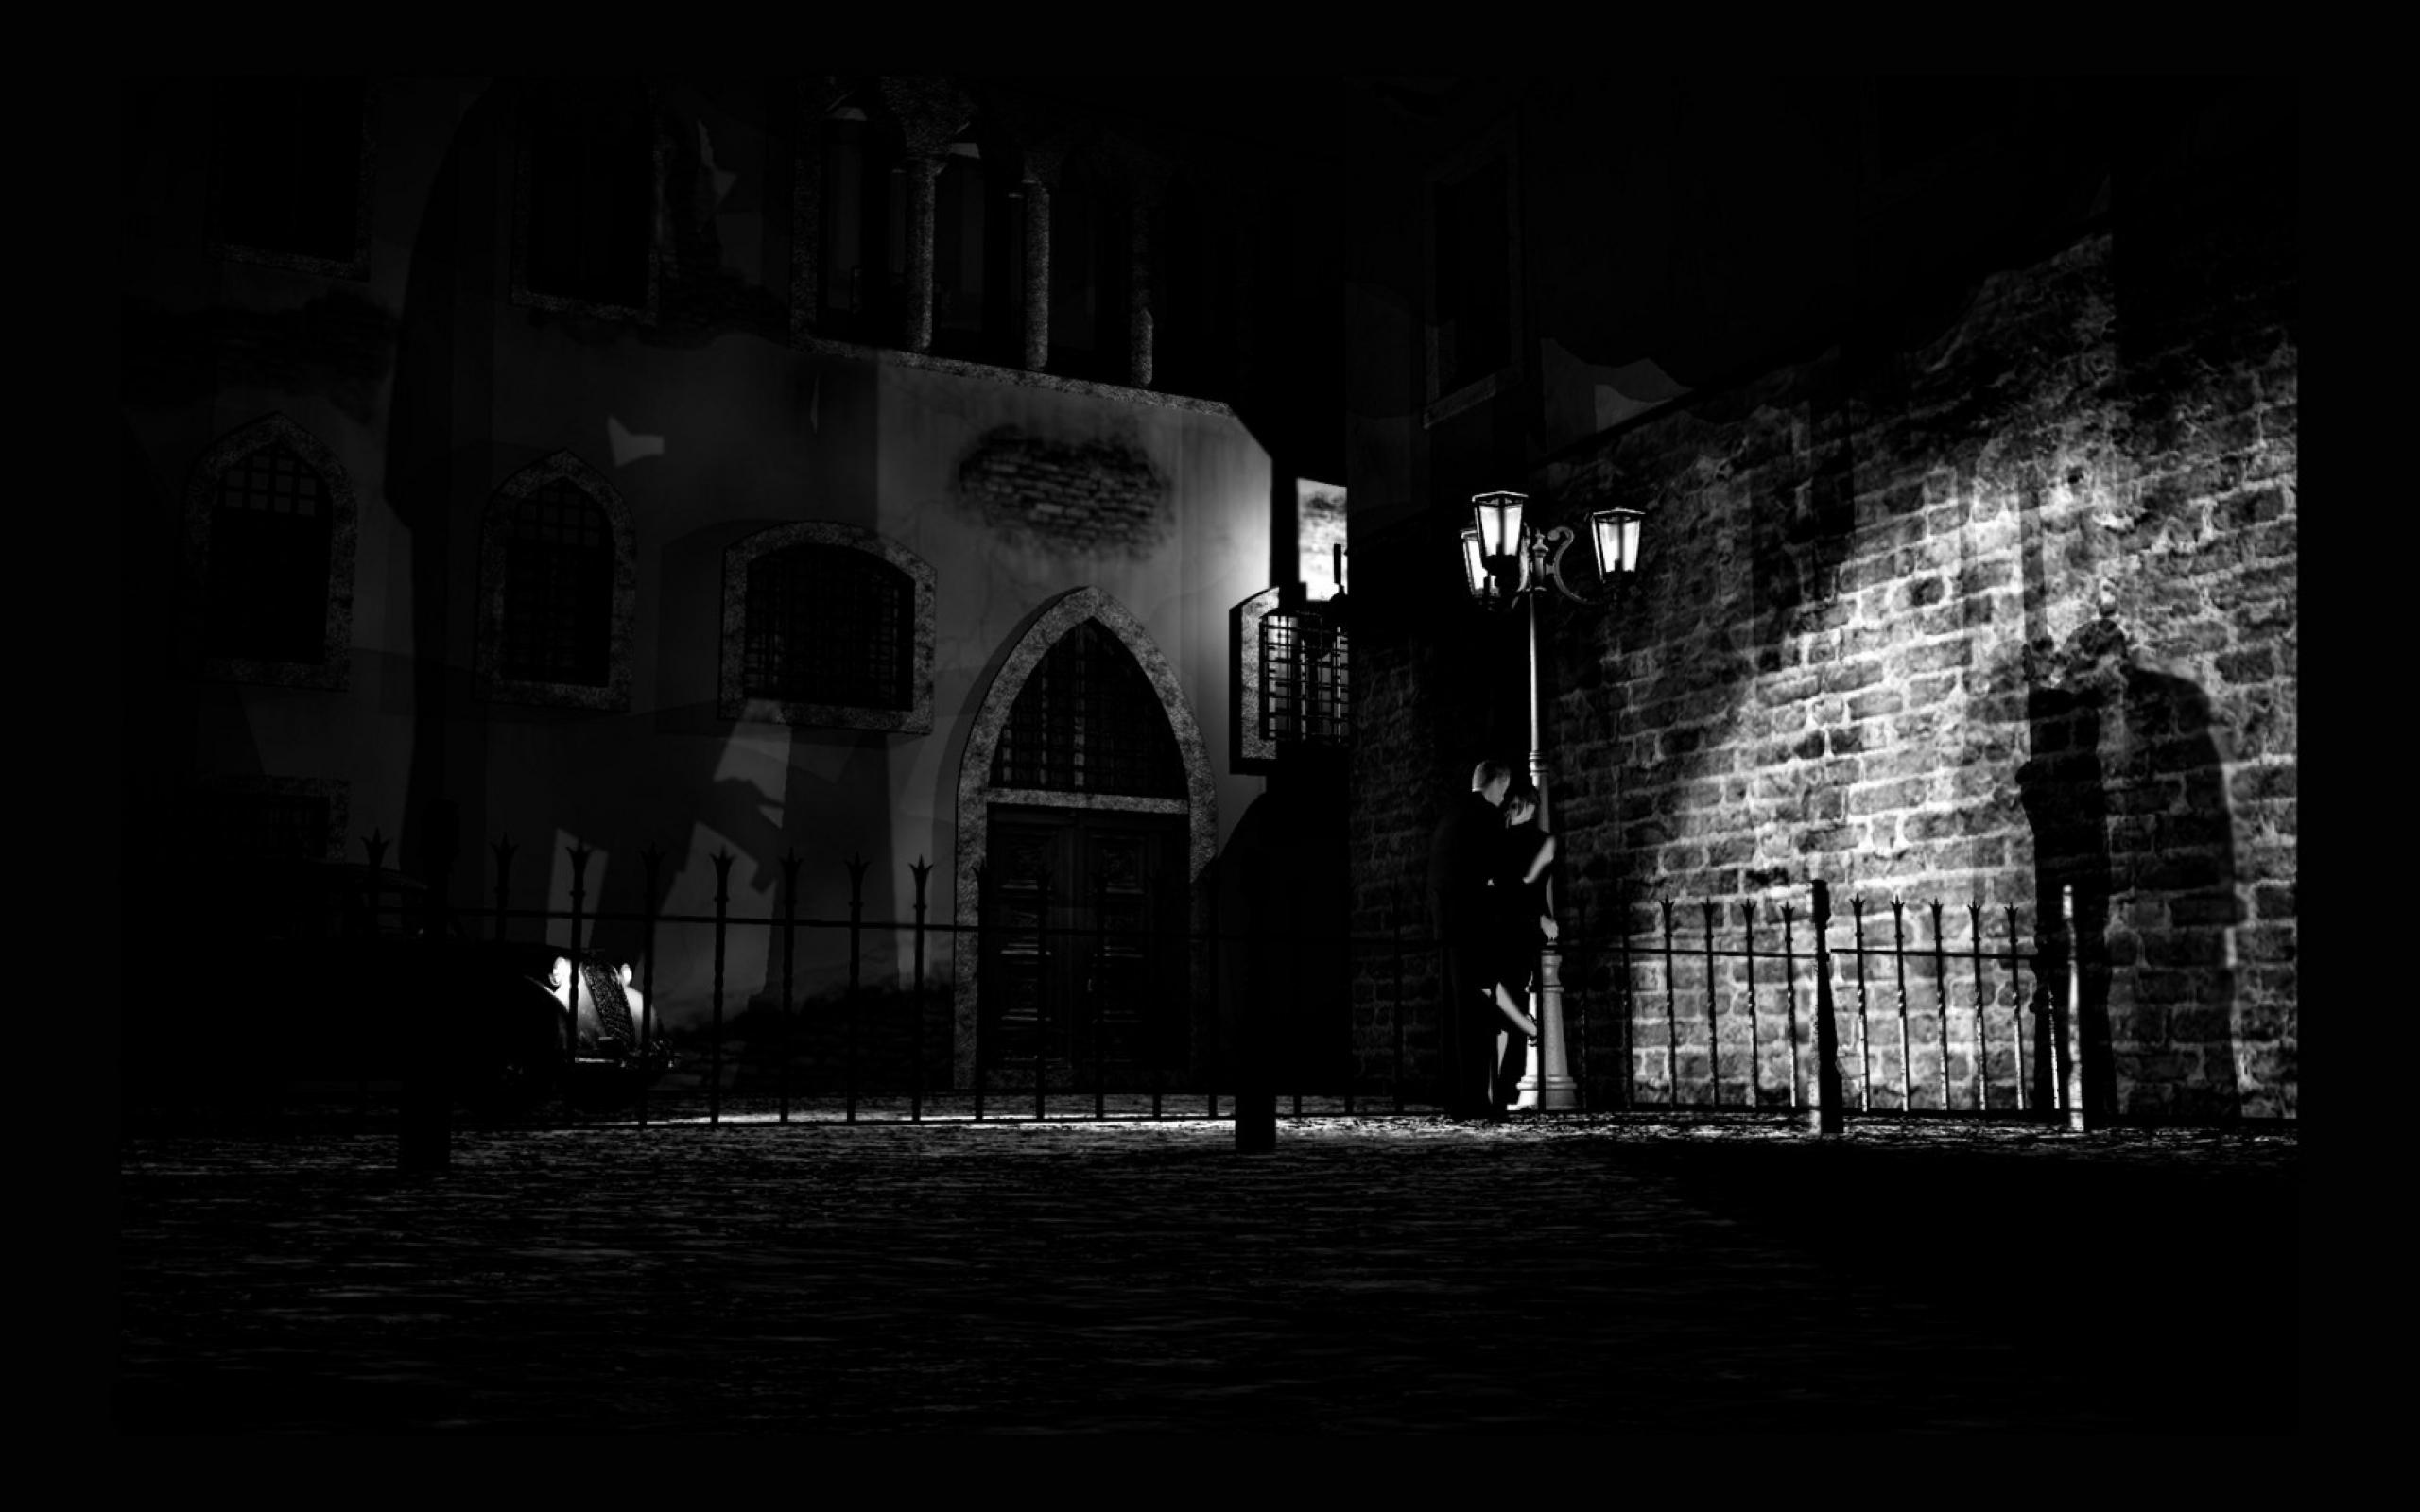 Wallpapers Download 2560x1600 amp film noir kiss 1680x1050 wallpaper 2560x1600